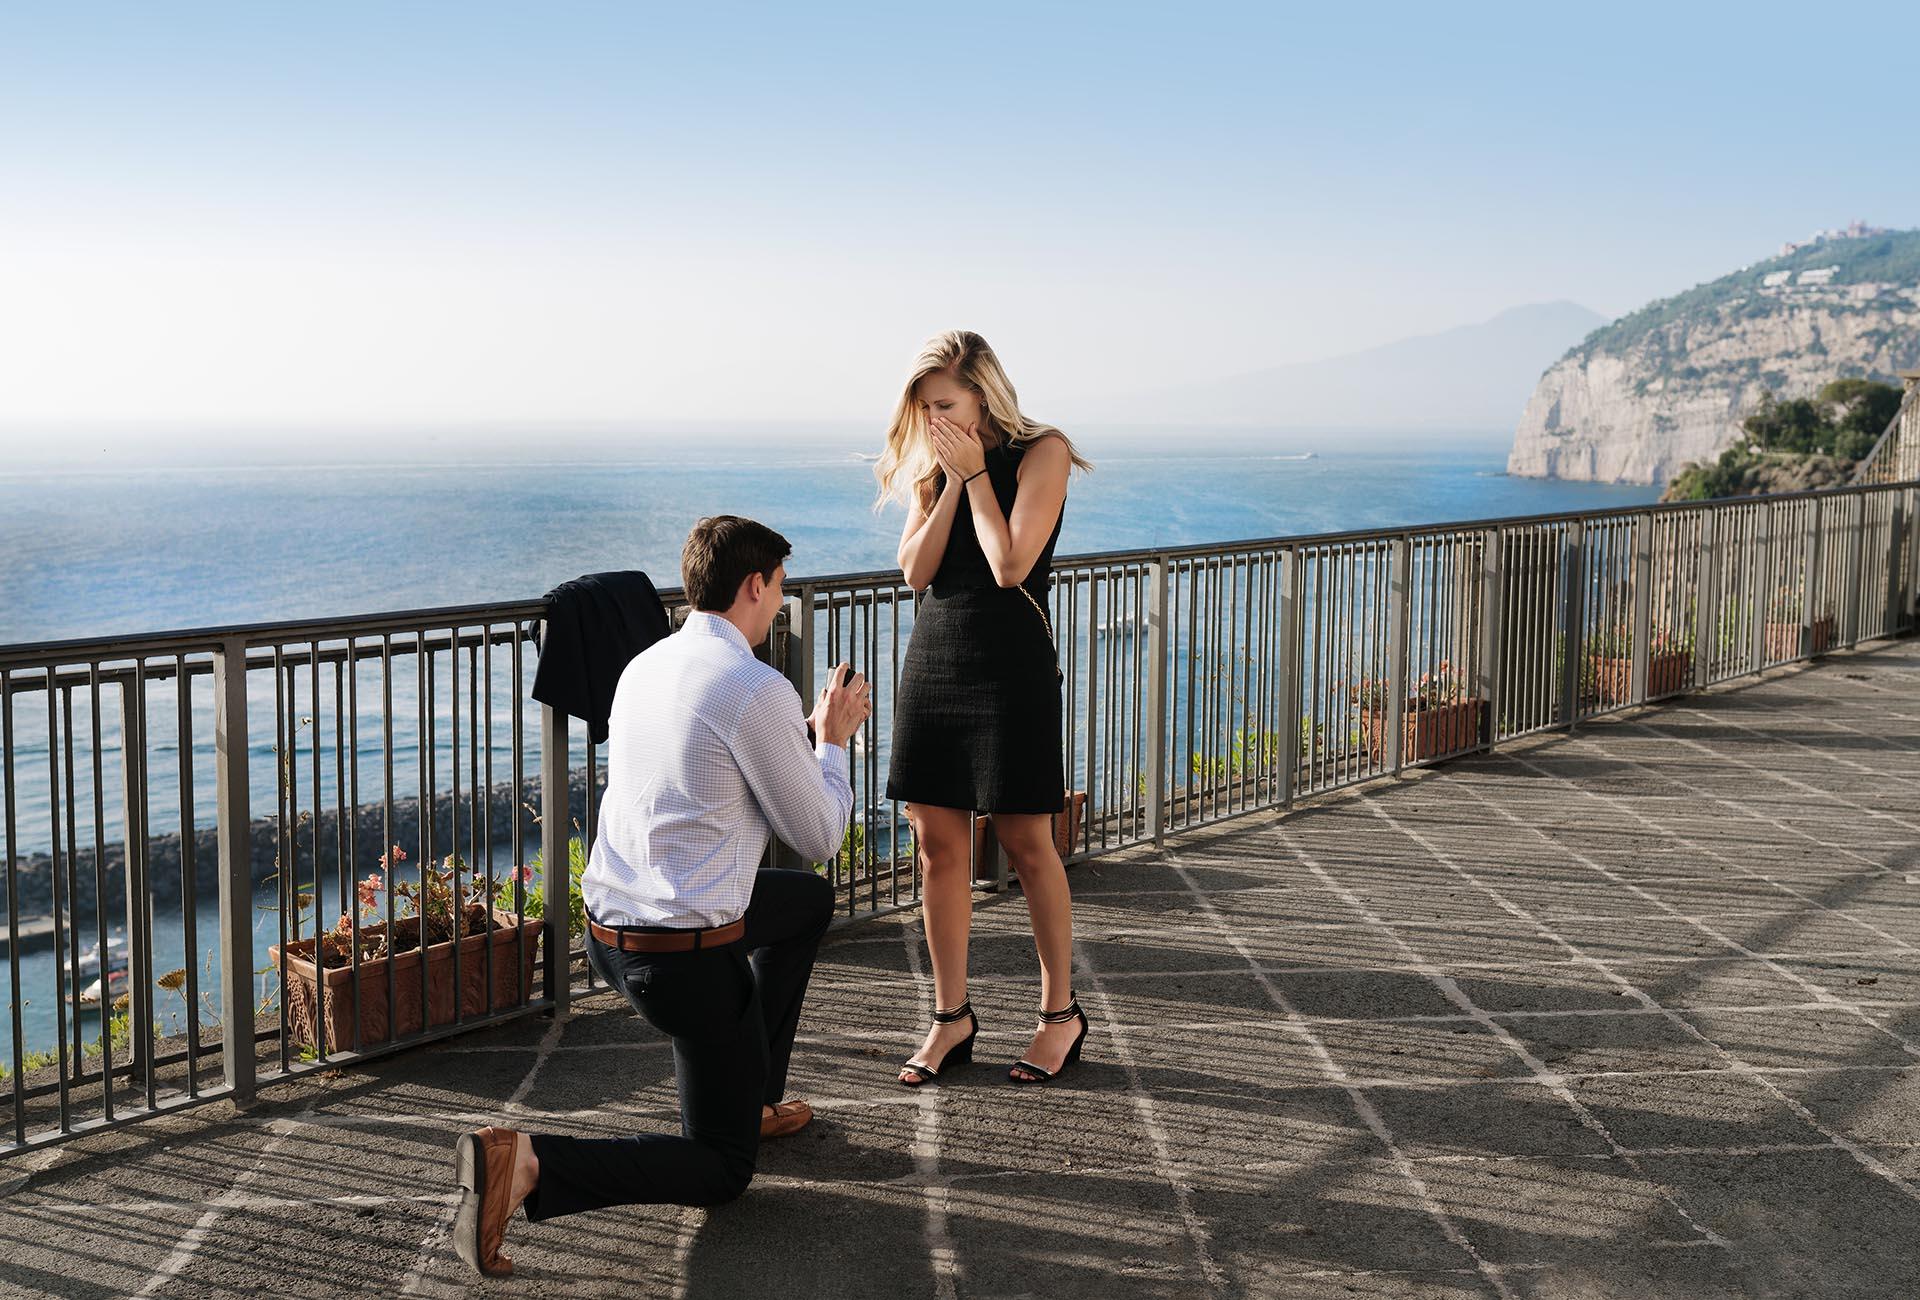 Proposta di matrimonio a sorpresa Costiera Amalfitana